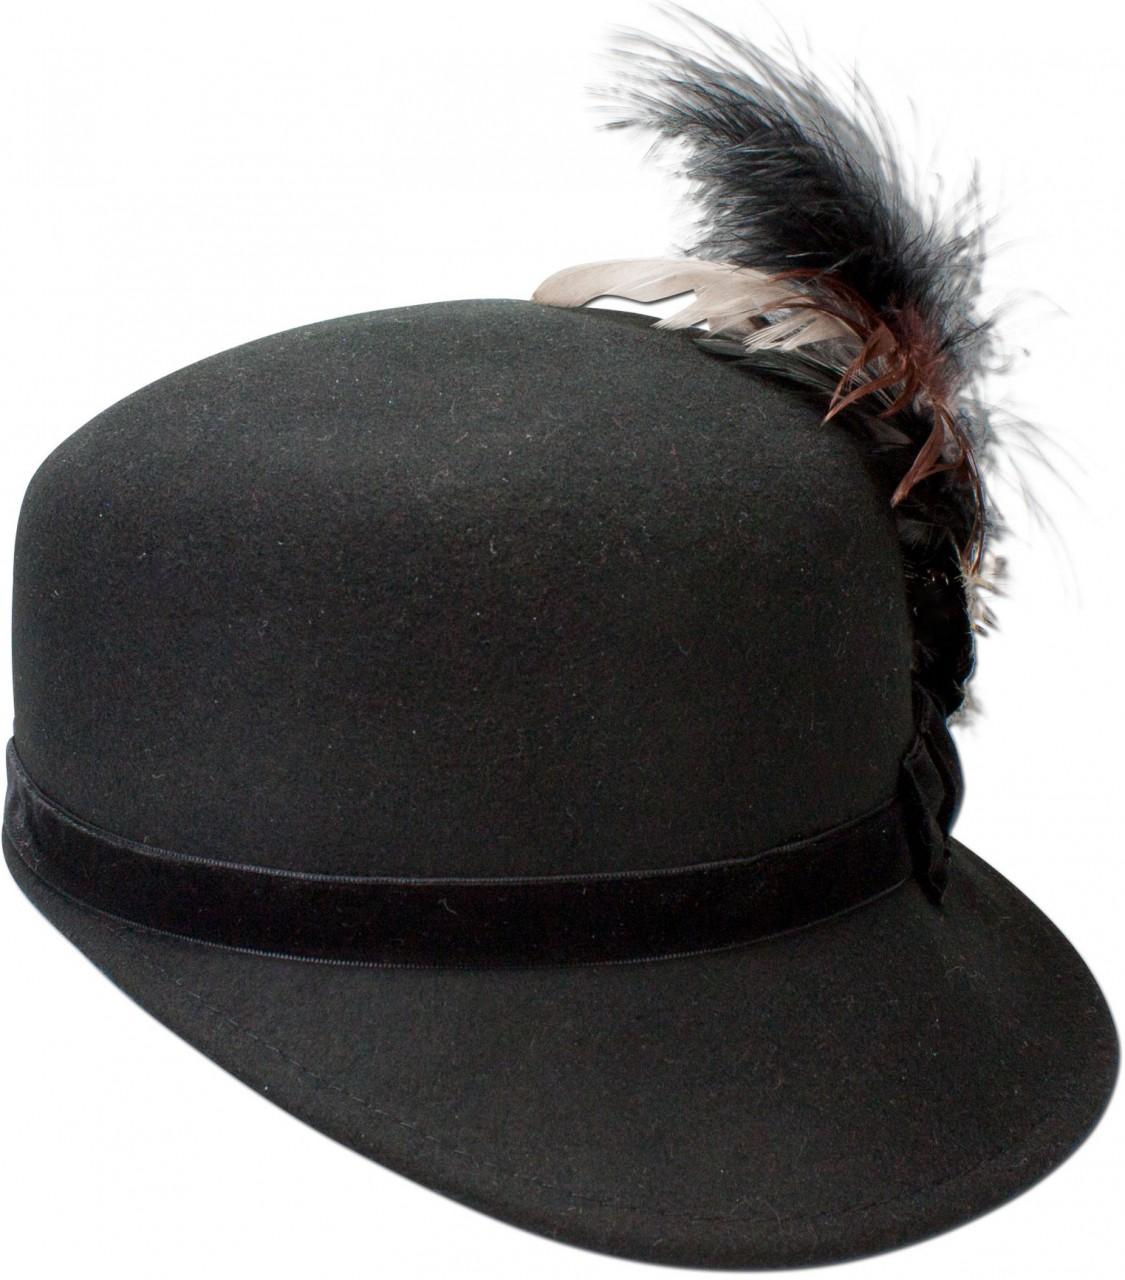 Trachtenhut Kappe Louisa schwarz